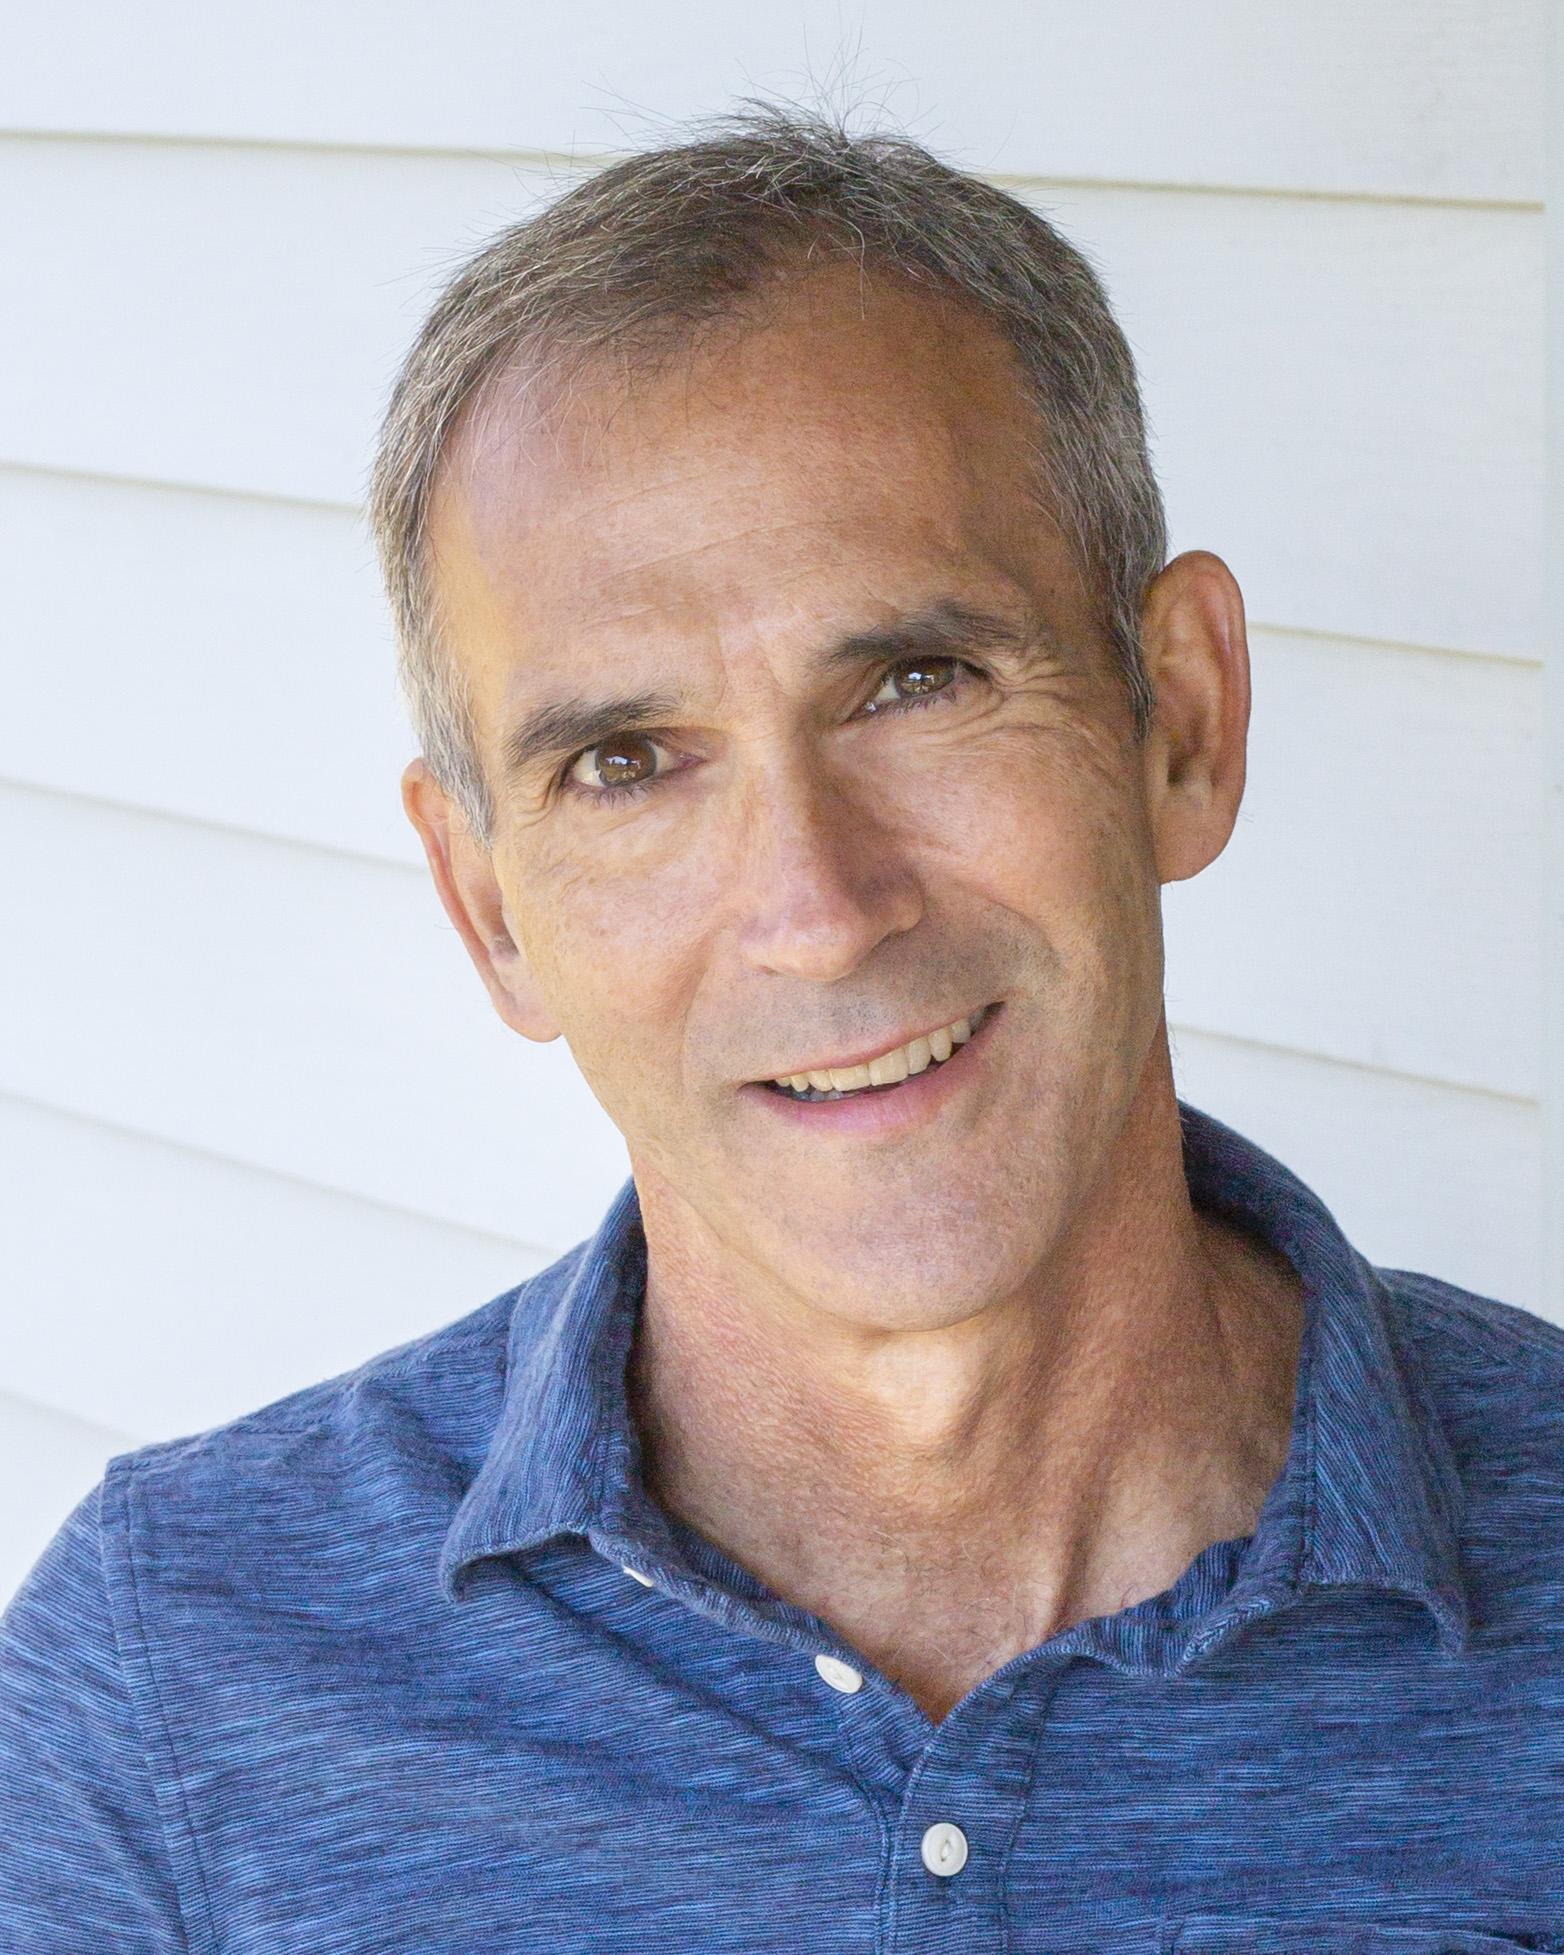 Author photo by Tasha Thomas.